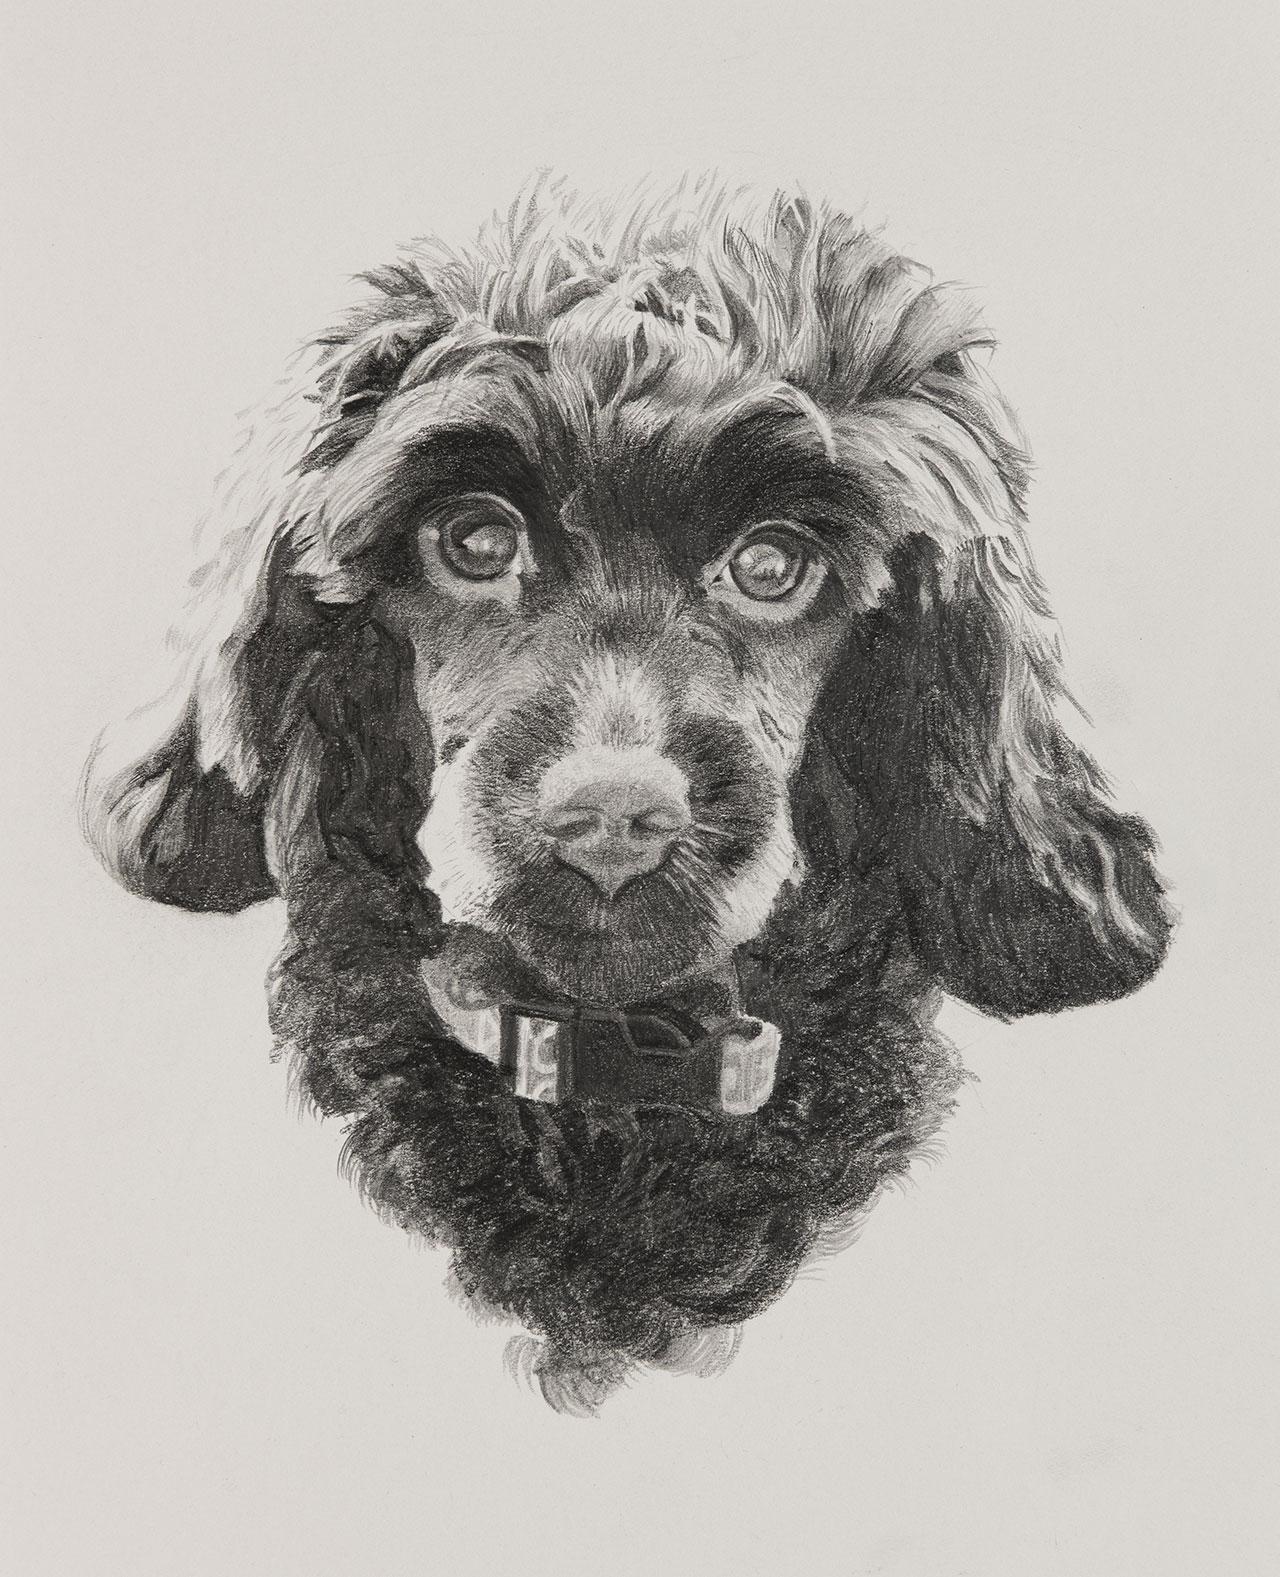 Winnie Dog Illustration by Harv Craven